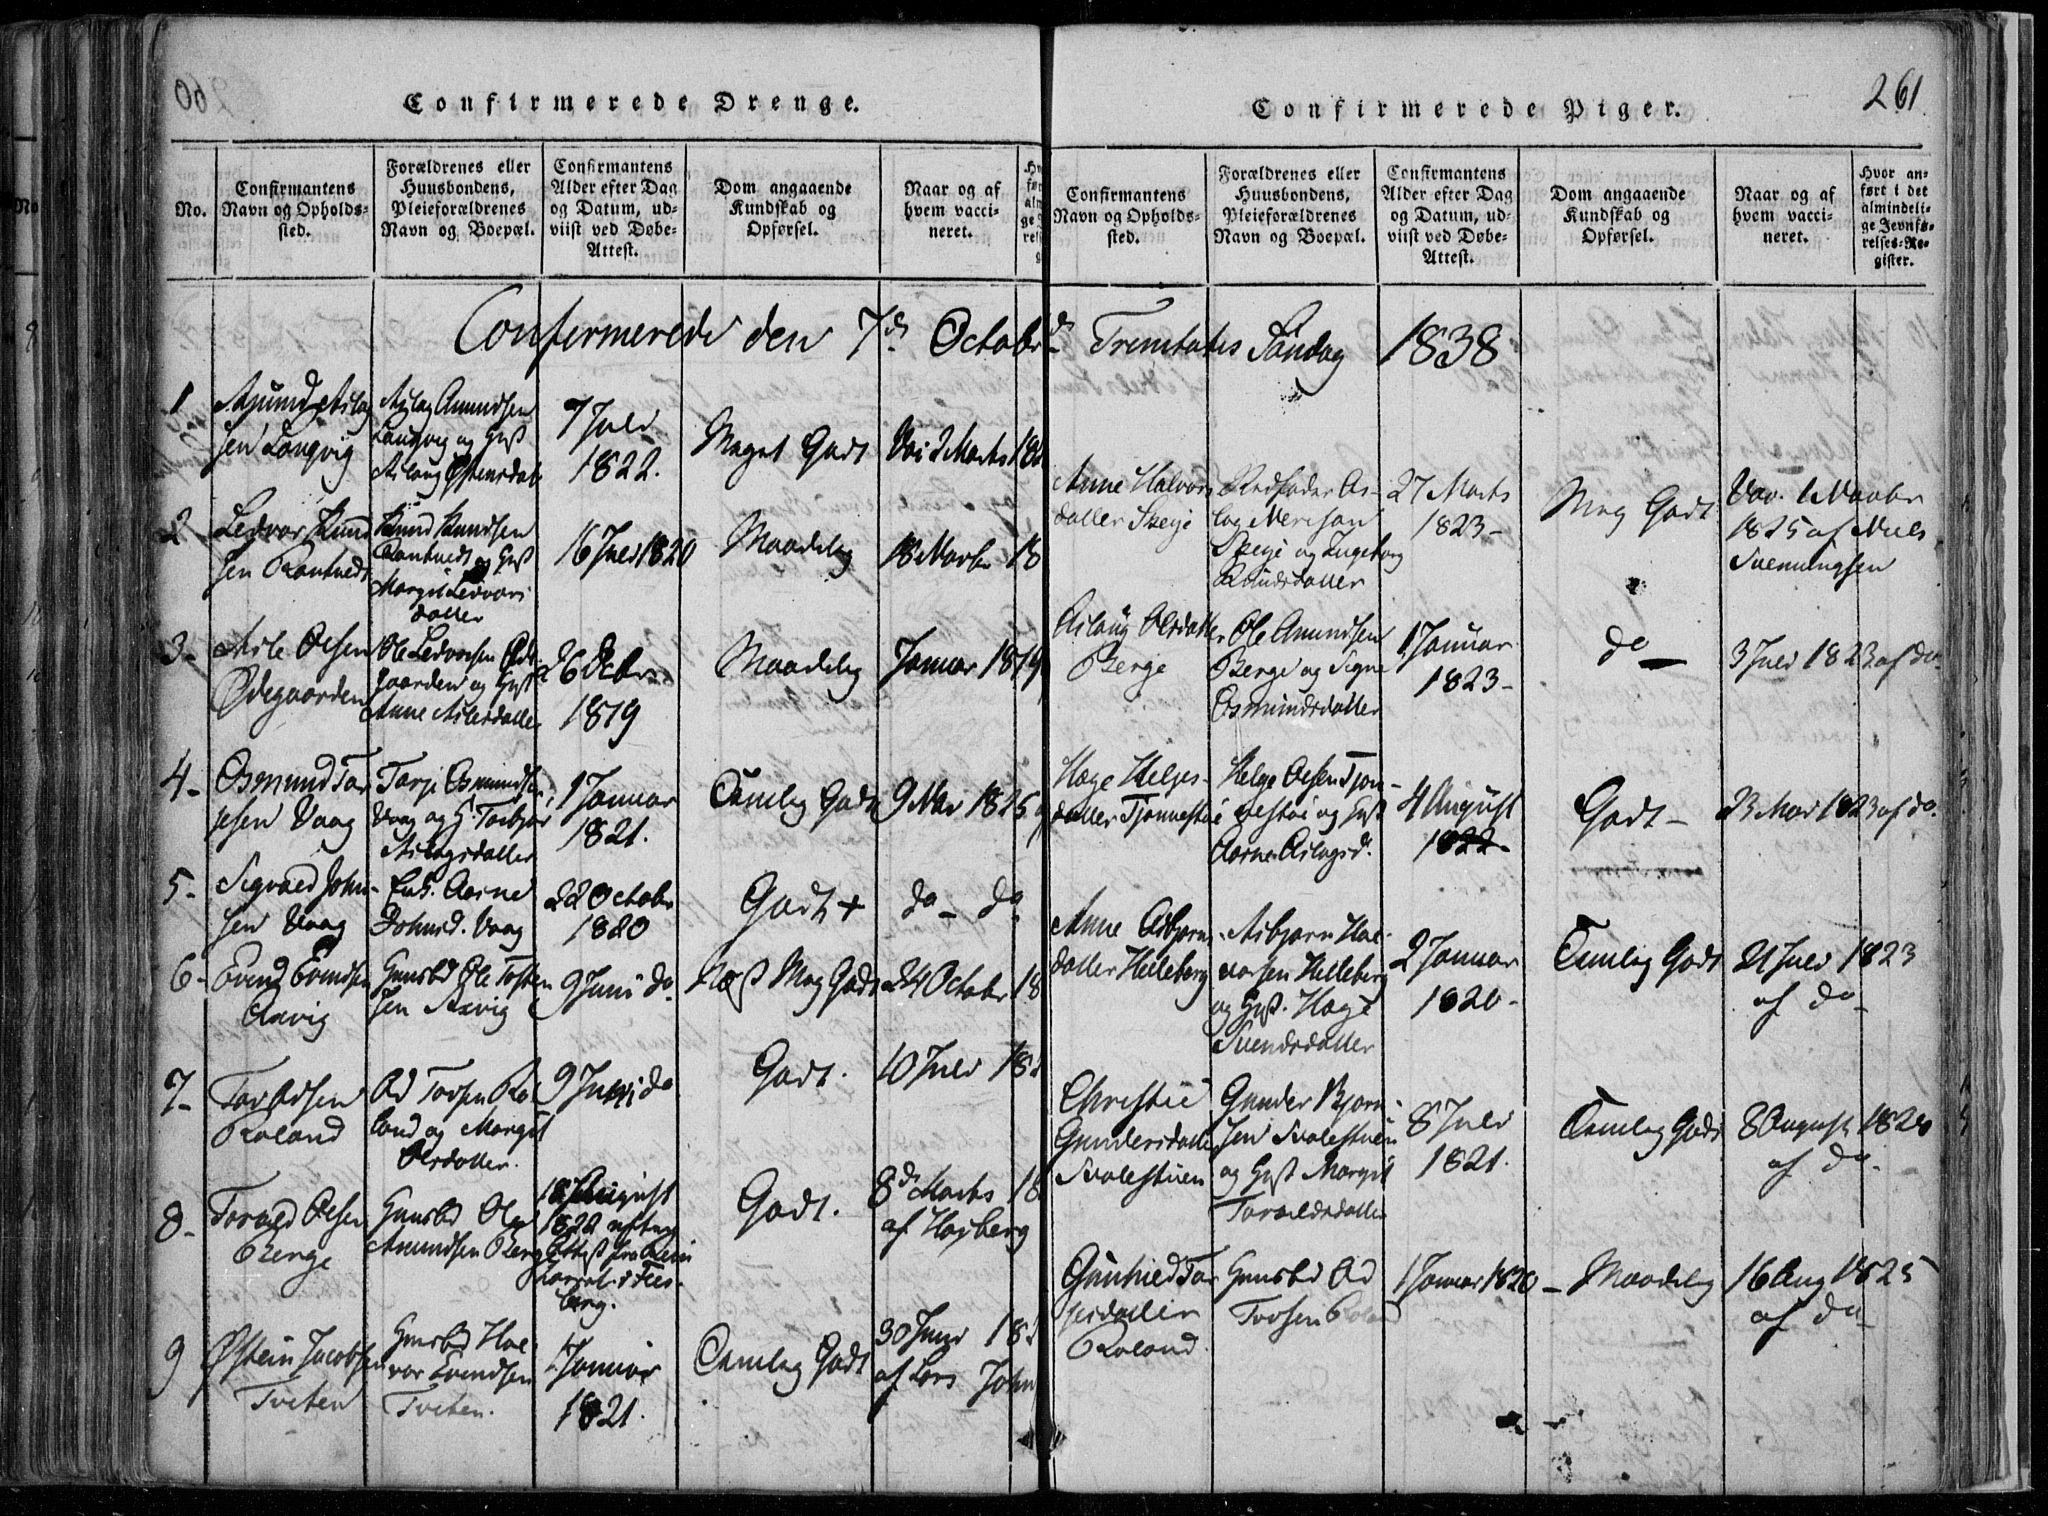 SAKO, Rauland kirkebøker, F/Fa/L0001: Ministerialbok nr. 1, 1814-1859, s. 261